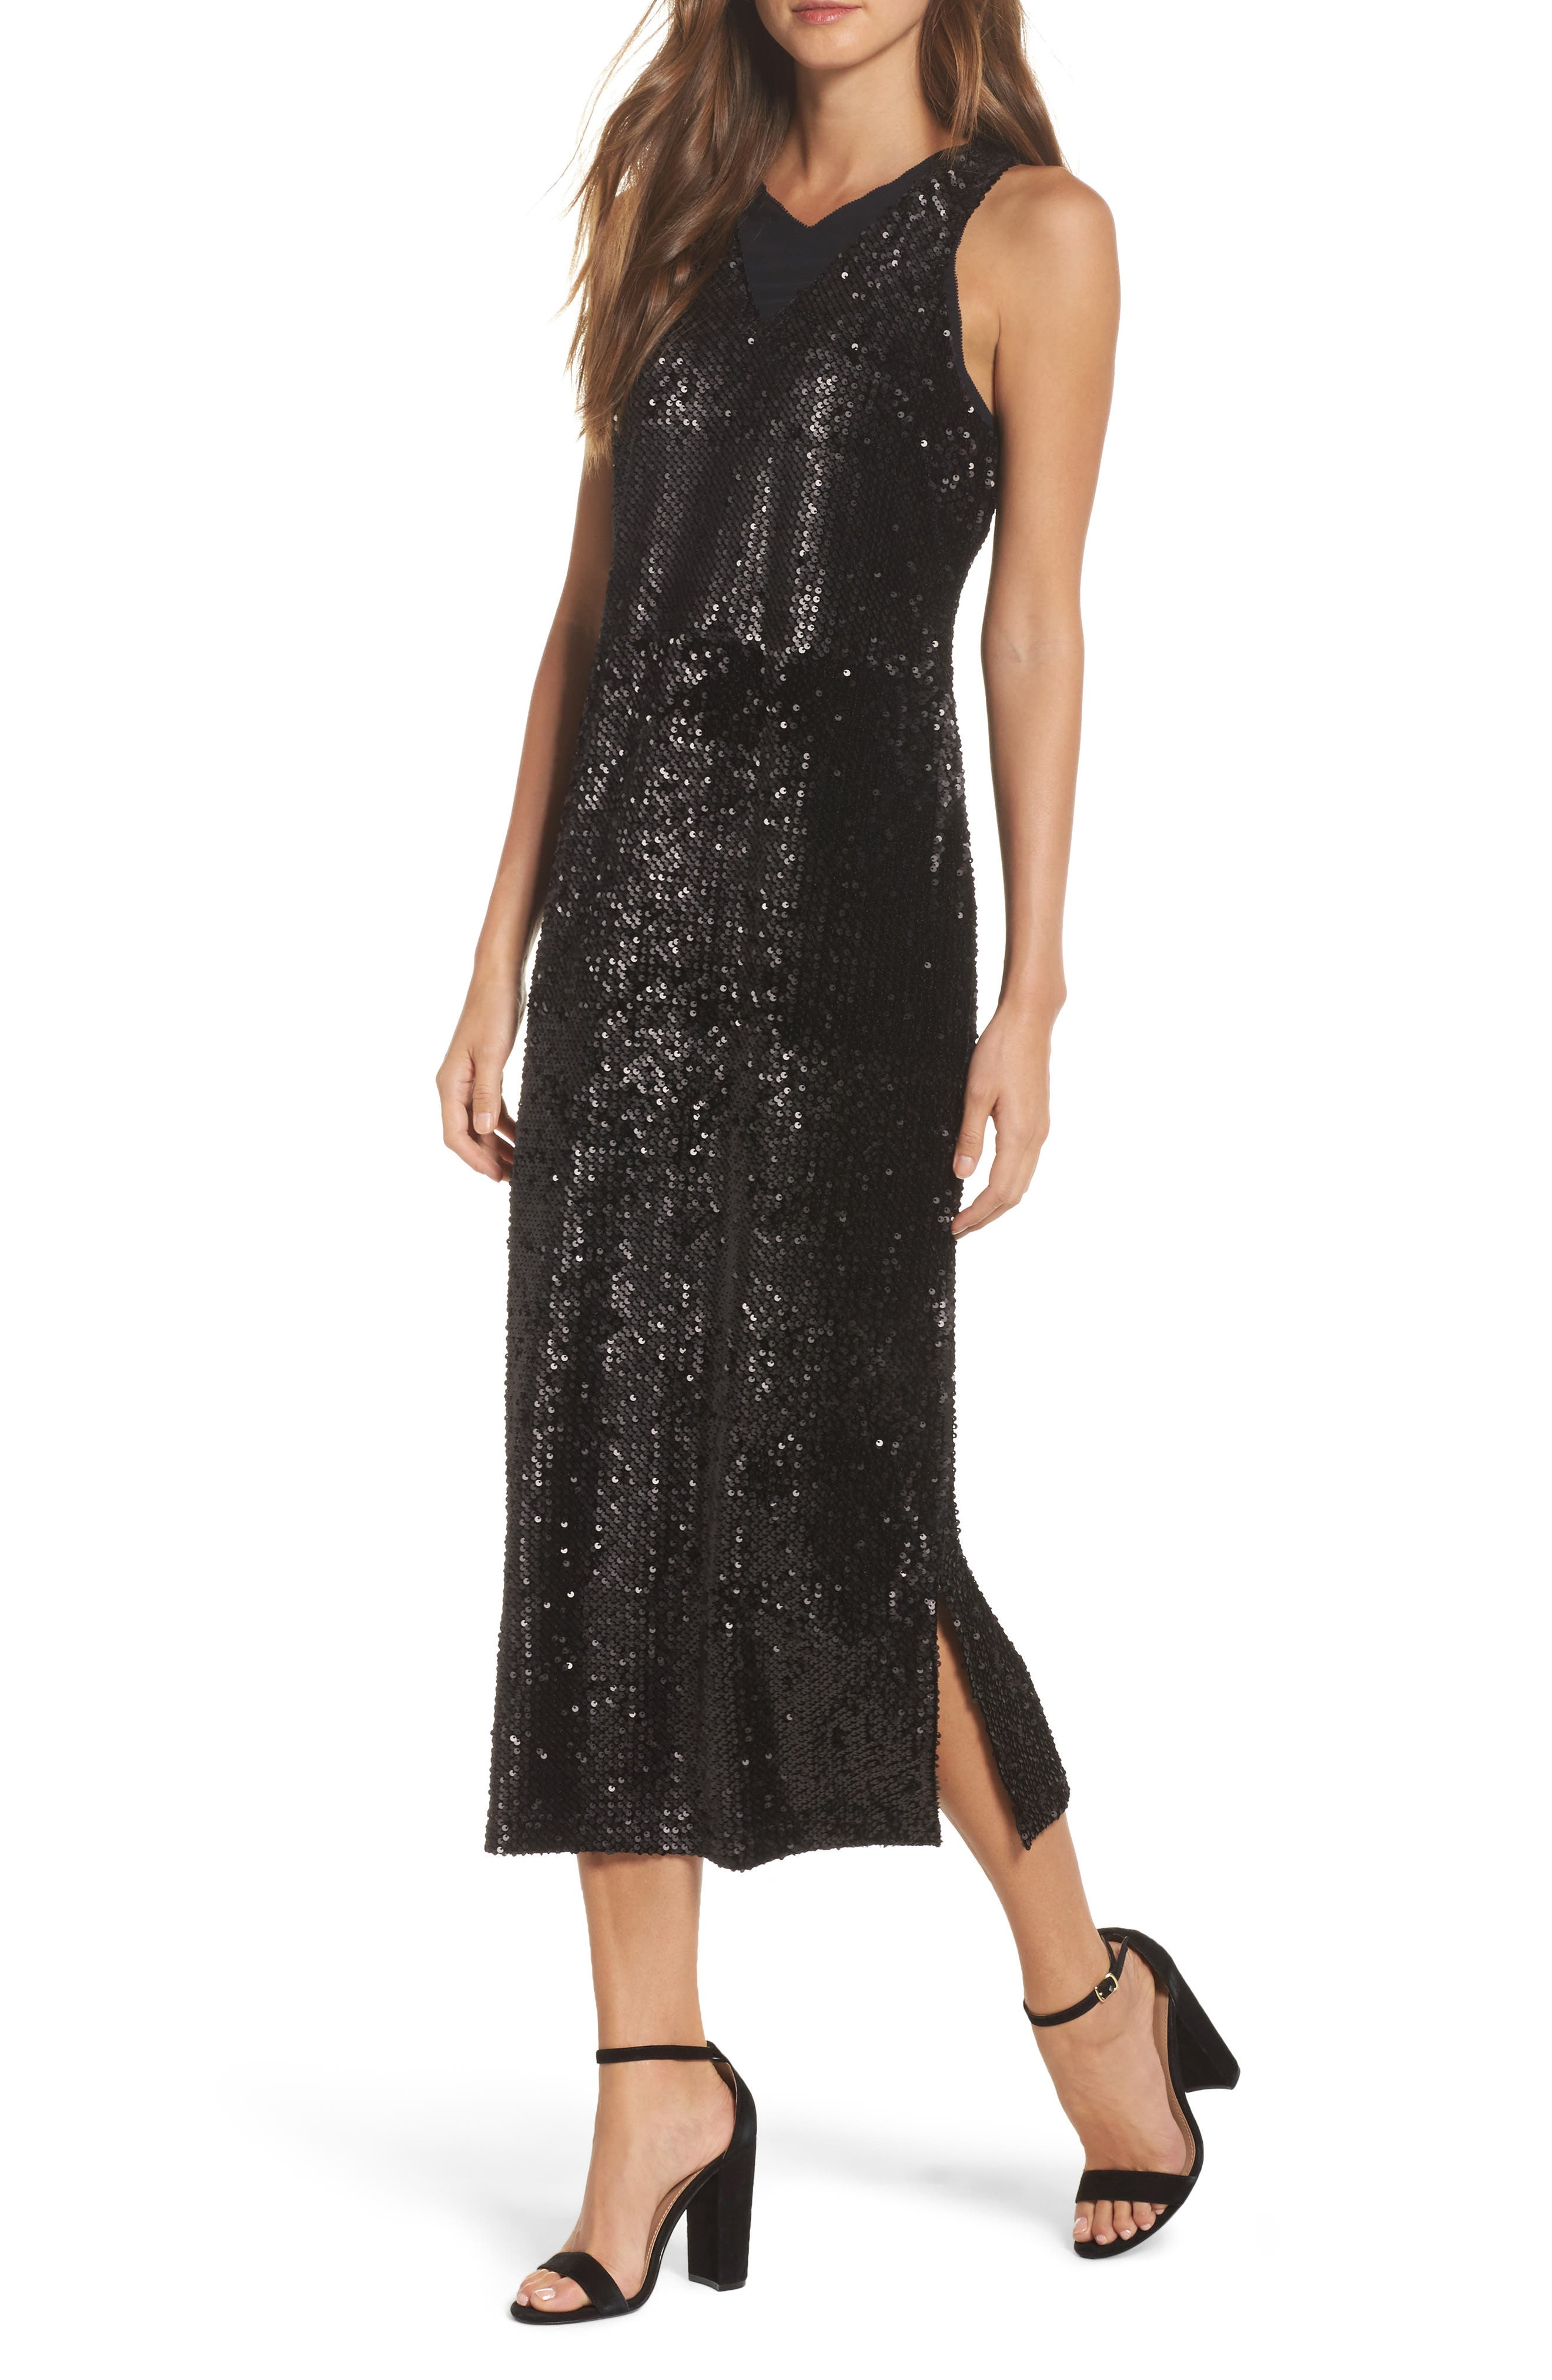 Alternate Image 1 Selected - NIC+ZOE Night Shimmer Sequin Midi Dress